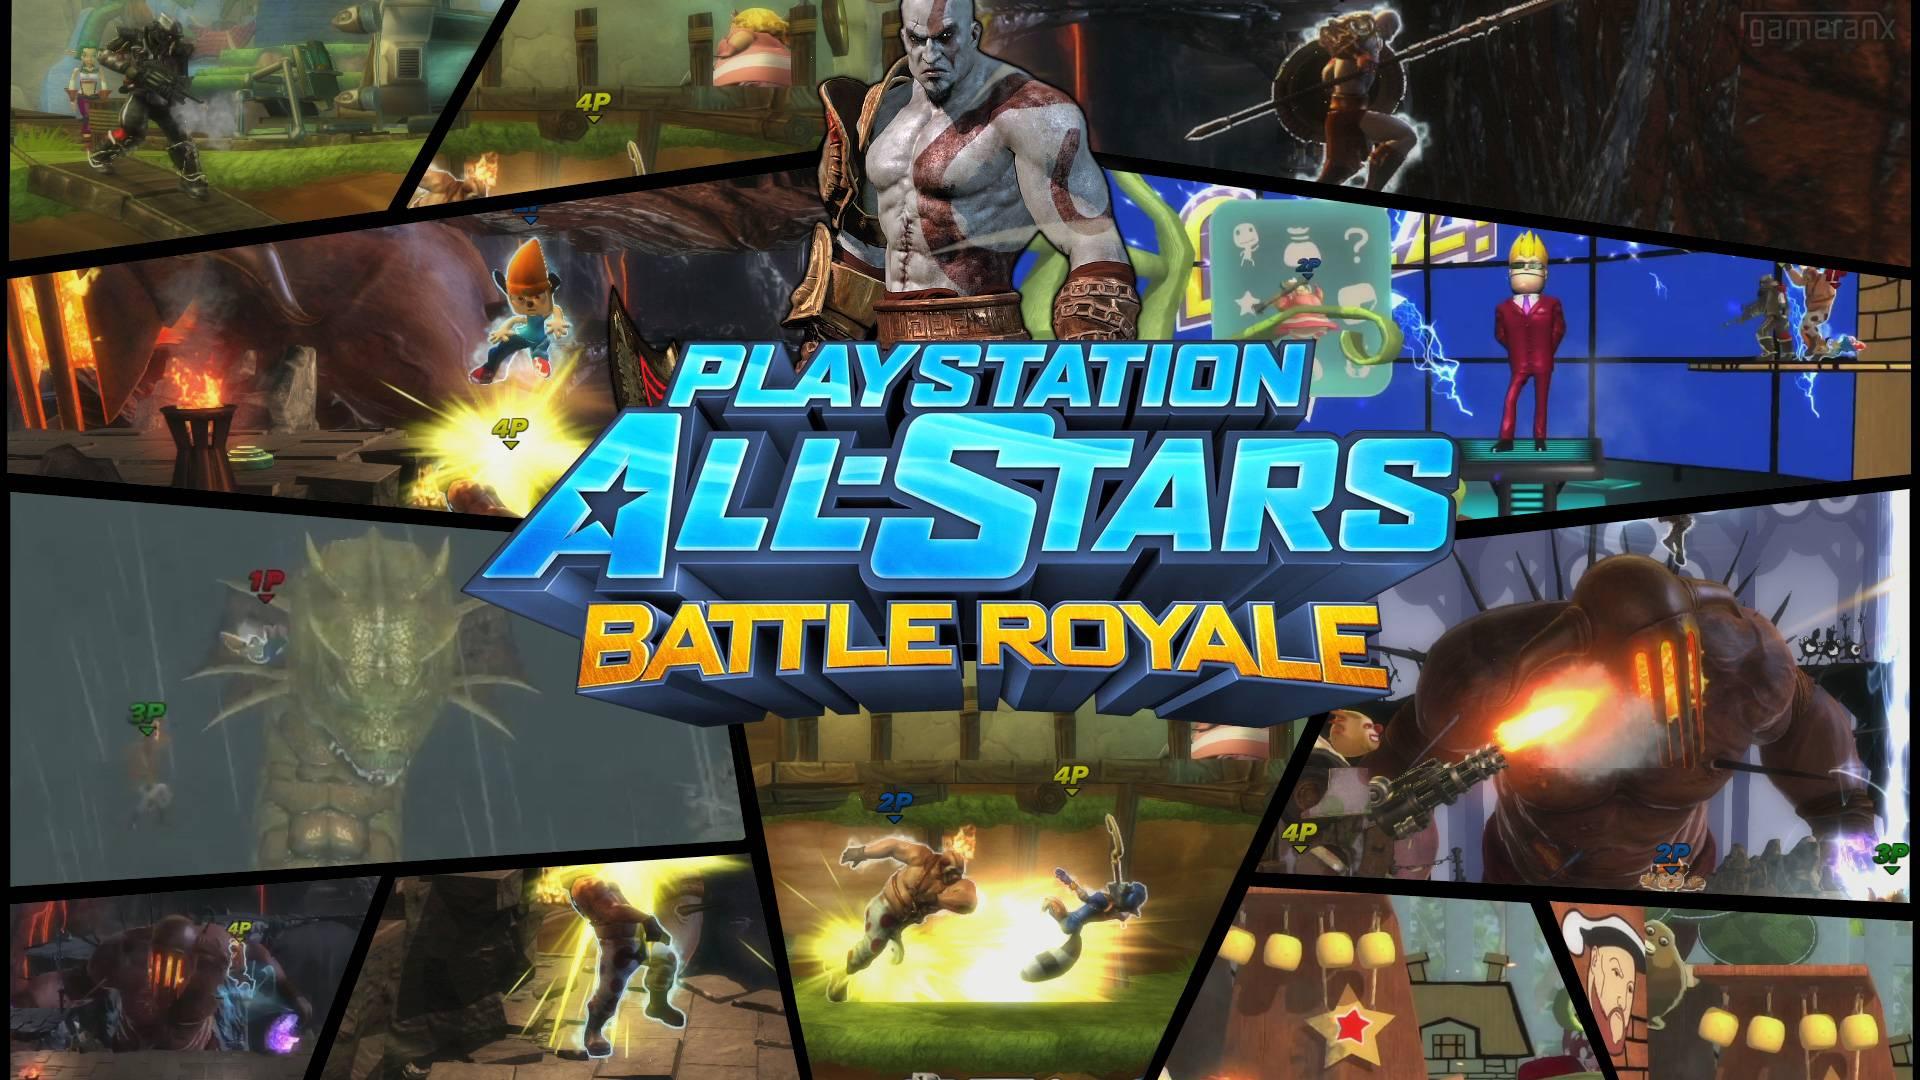 playstation-all-stars-battle-royale-wallpaper-hd.jpg